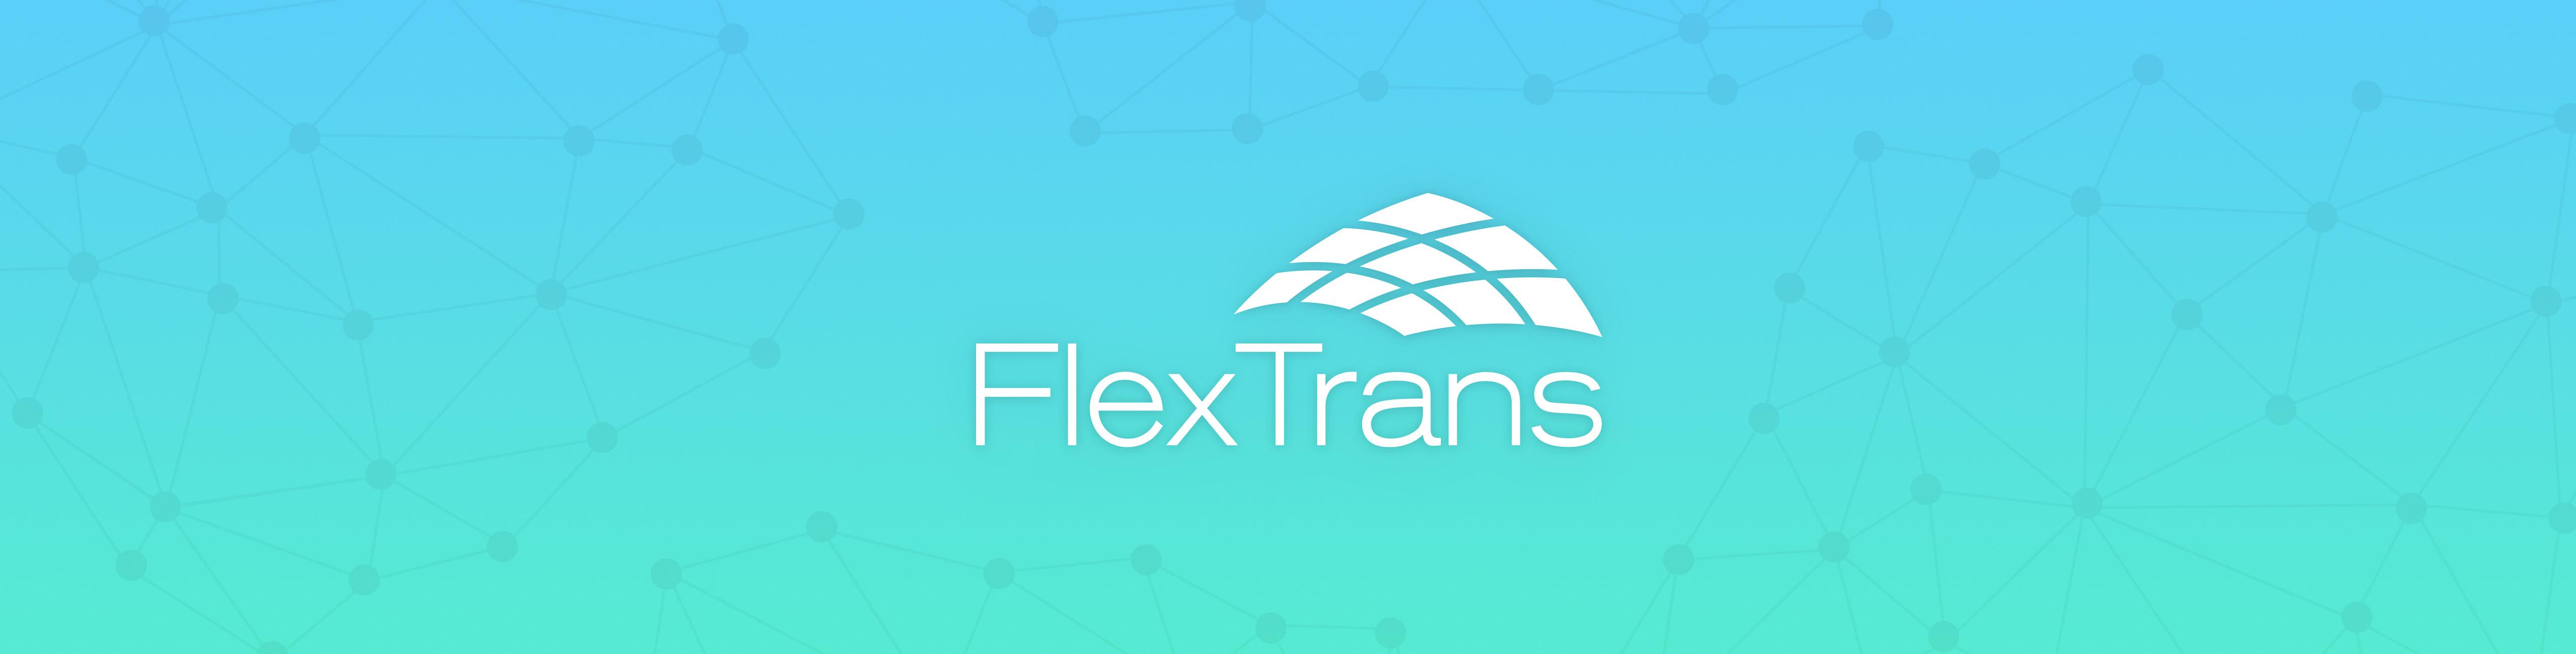 FlexTrans Branding